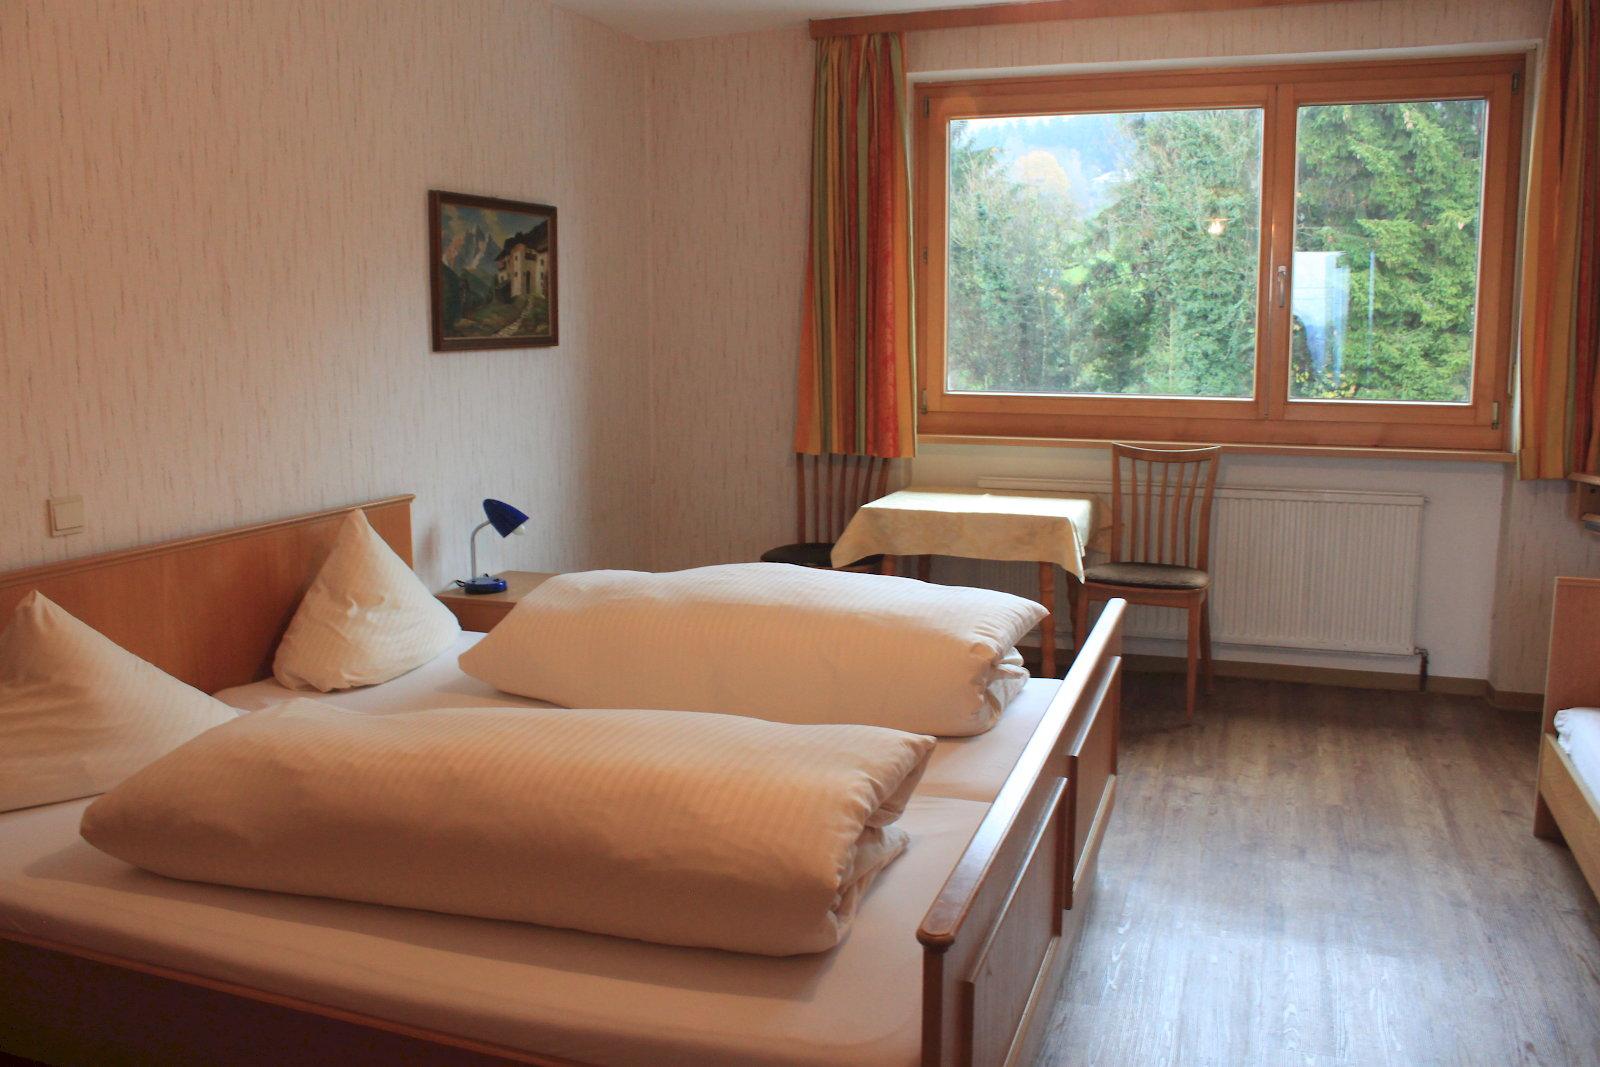 Appartement de vacances B&B - Restaurant TSINGDAO (Hörbranz). Dreibettzimmer (2437459), Hörbranz, Bregenz, Vorarlberg, Autriche, image 8